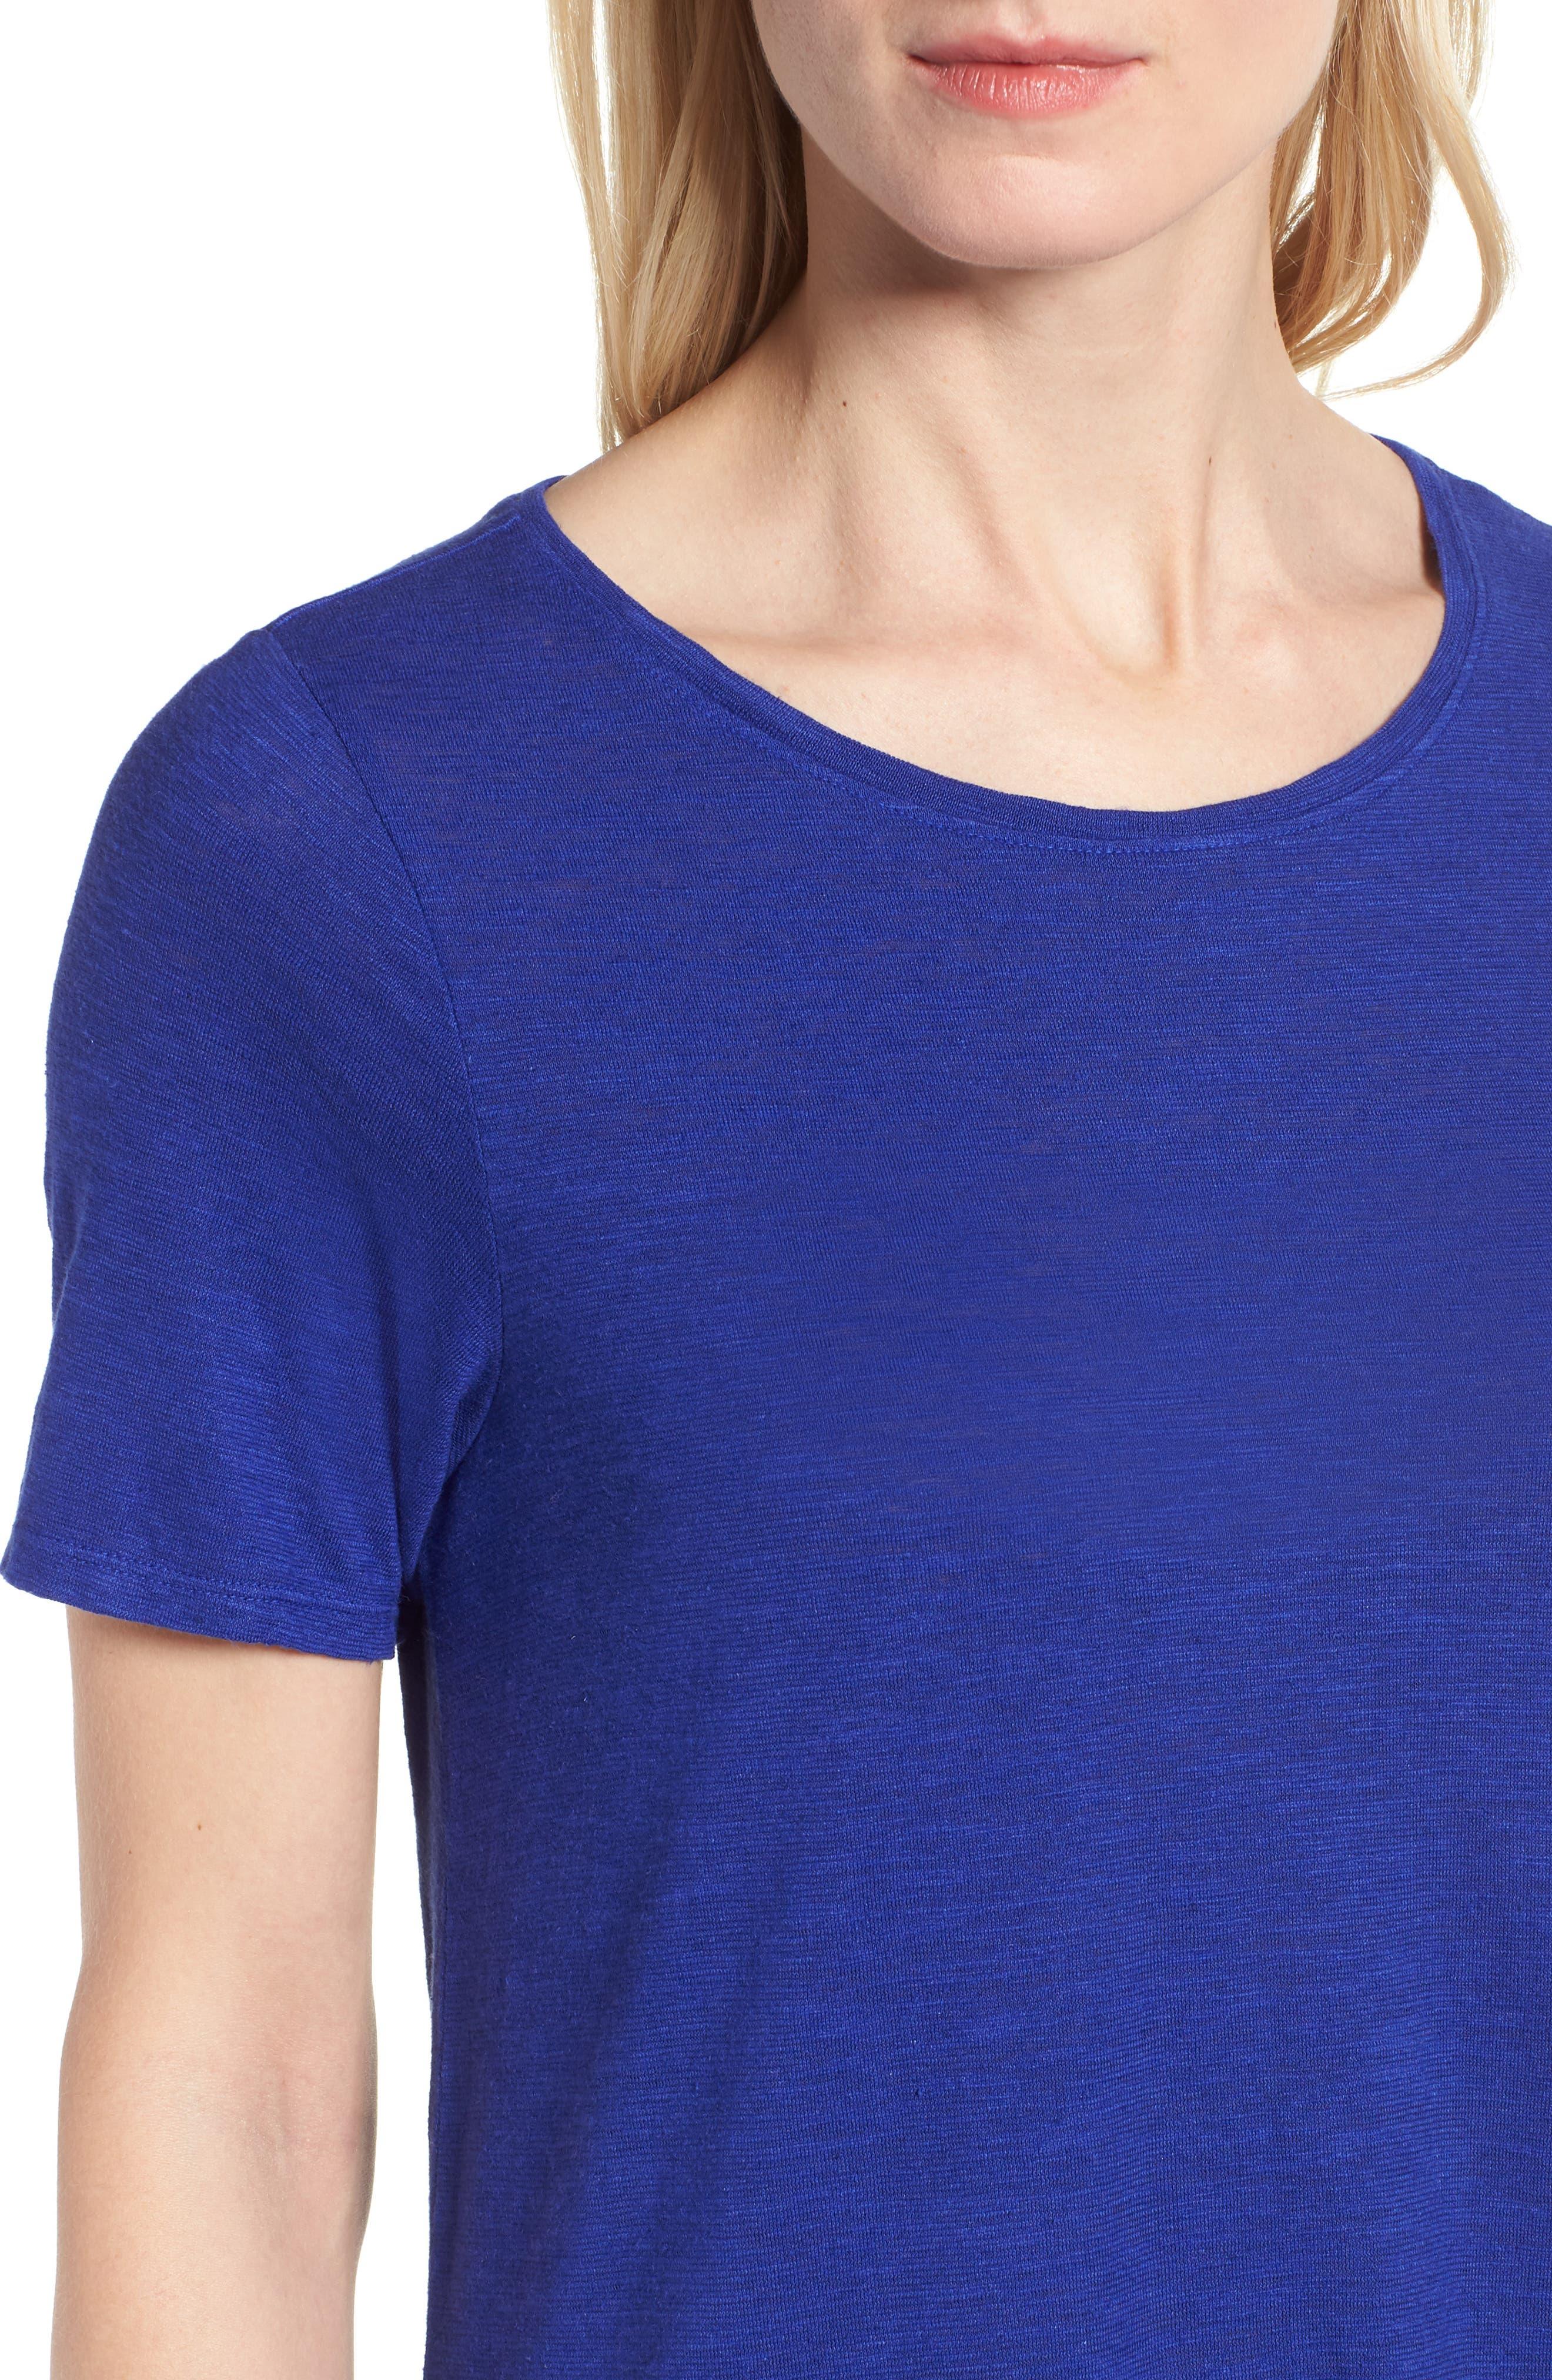 Asymmetrical Hemp Blend Shift Dress,                             Alternate thumbnail 4, color,                             Blue Violet